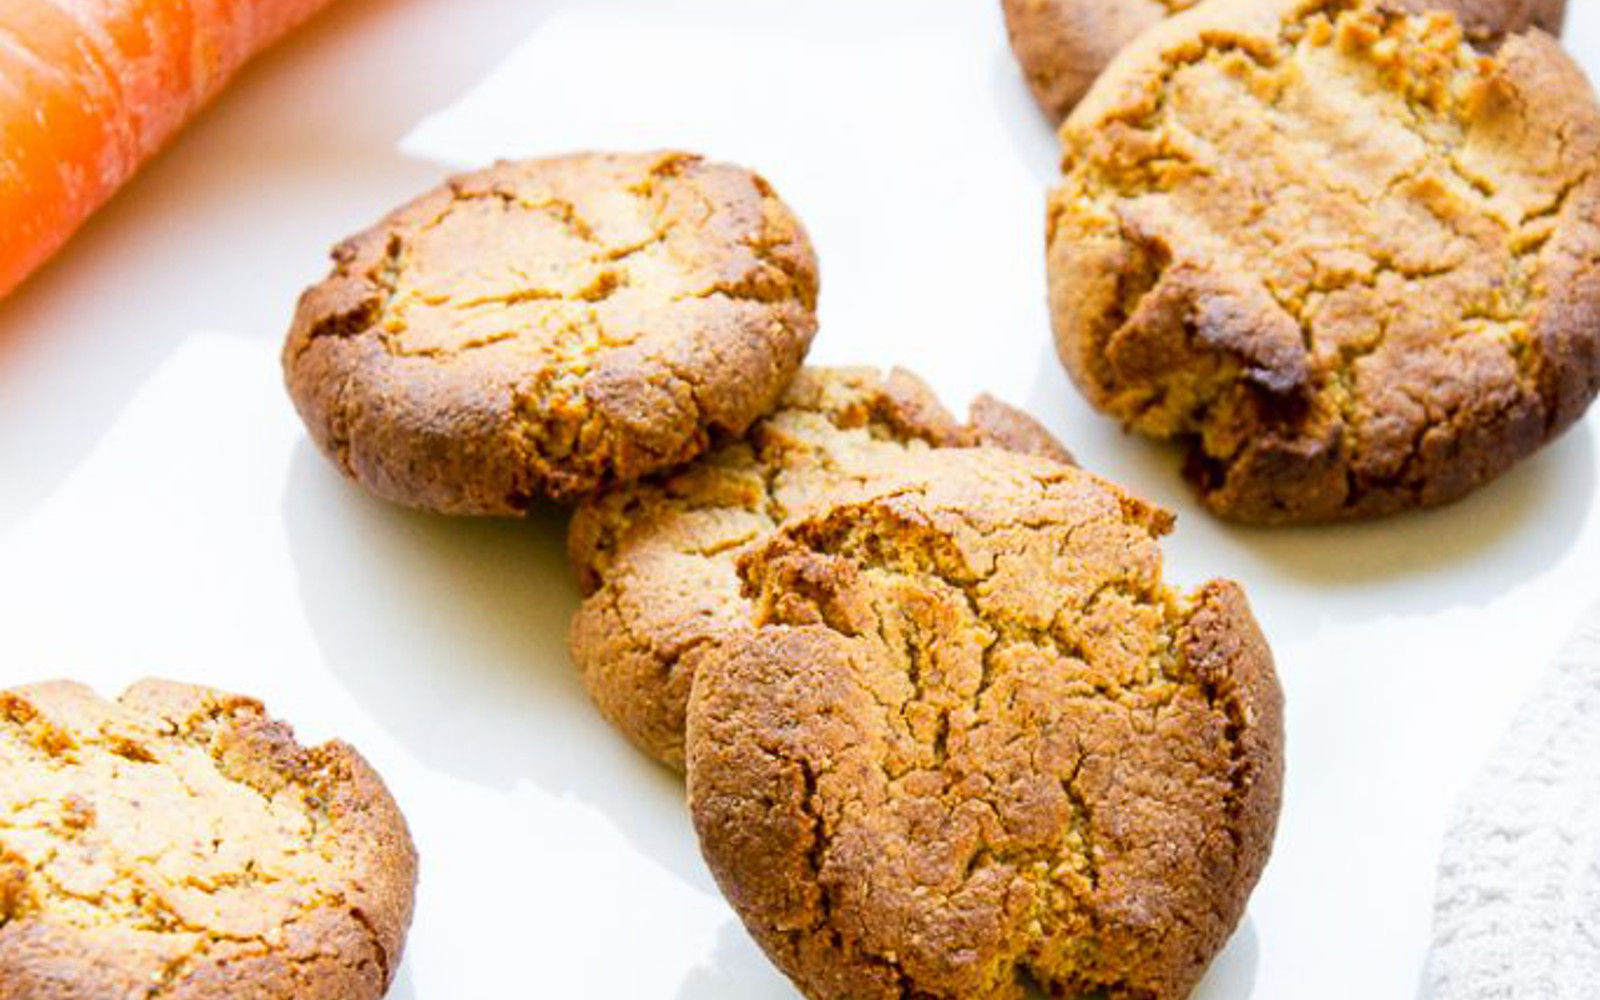 Vegan Gluten-Free Savory Almond Carrot Biscuits